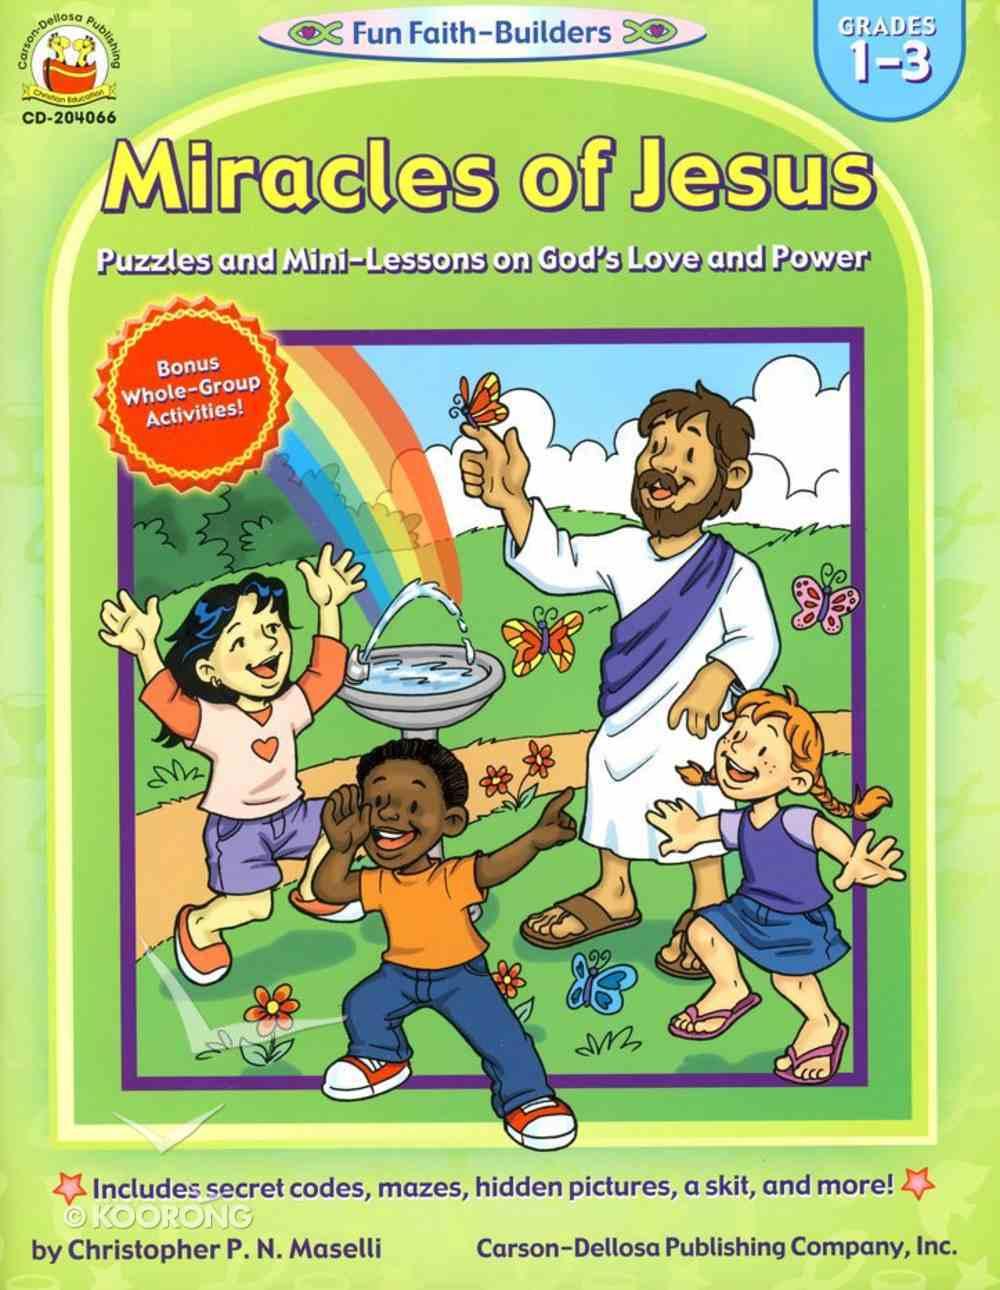 Miracles of Jesus (Grades 1-3) (Fun Faith-builders Series) Paperback